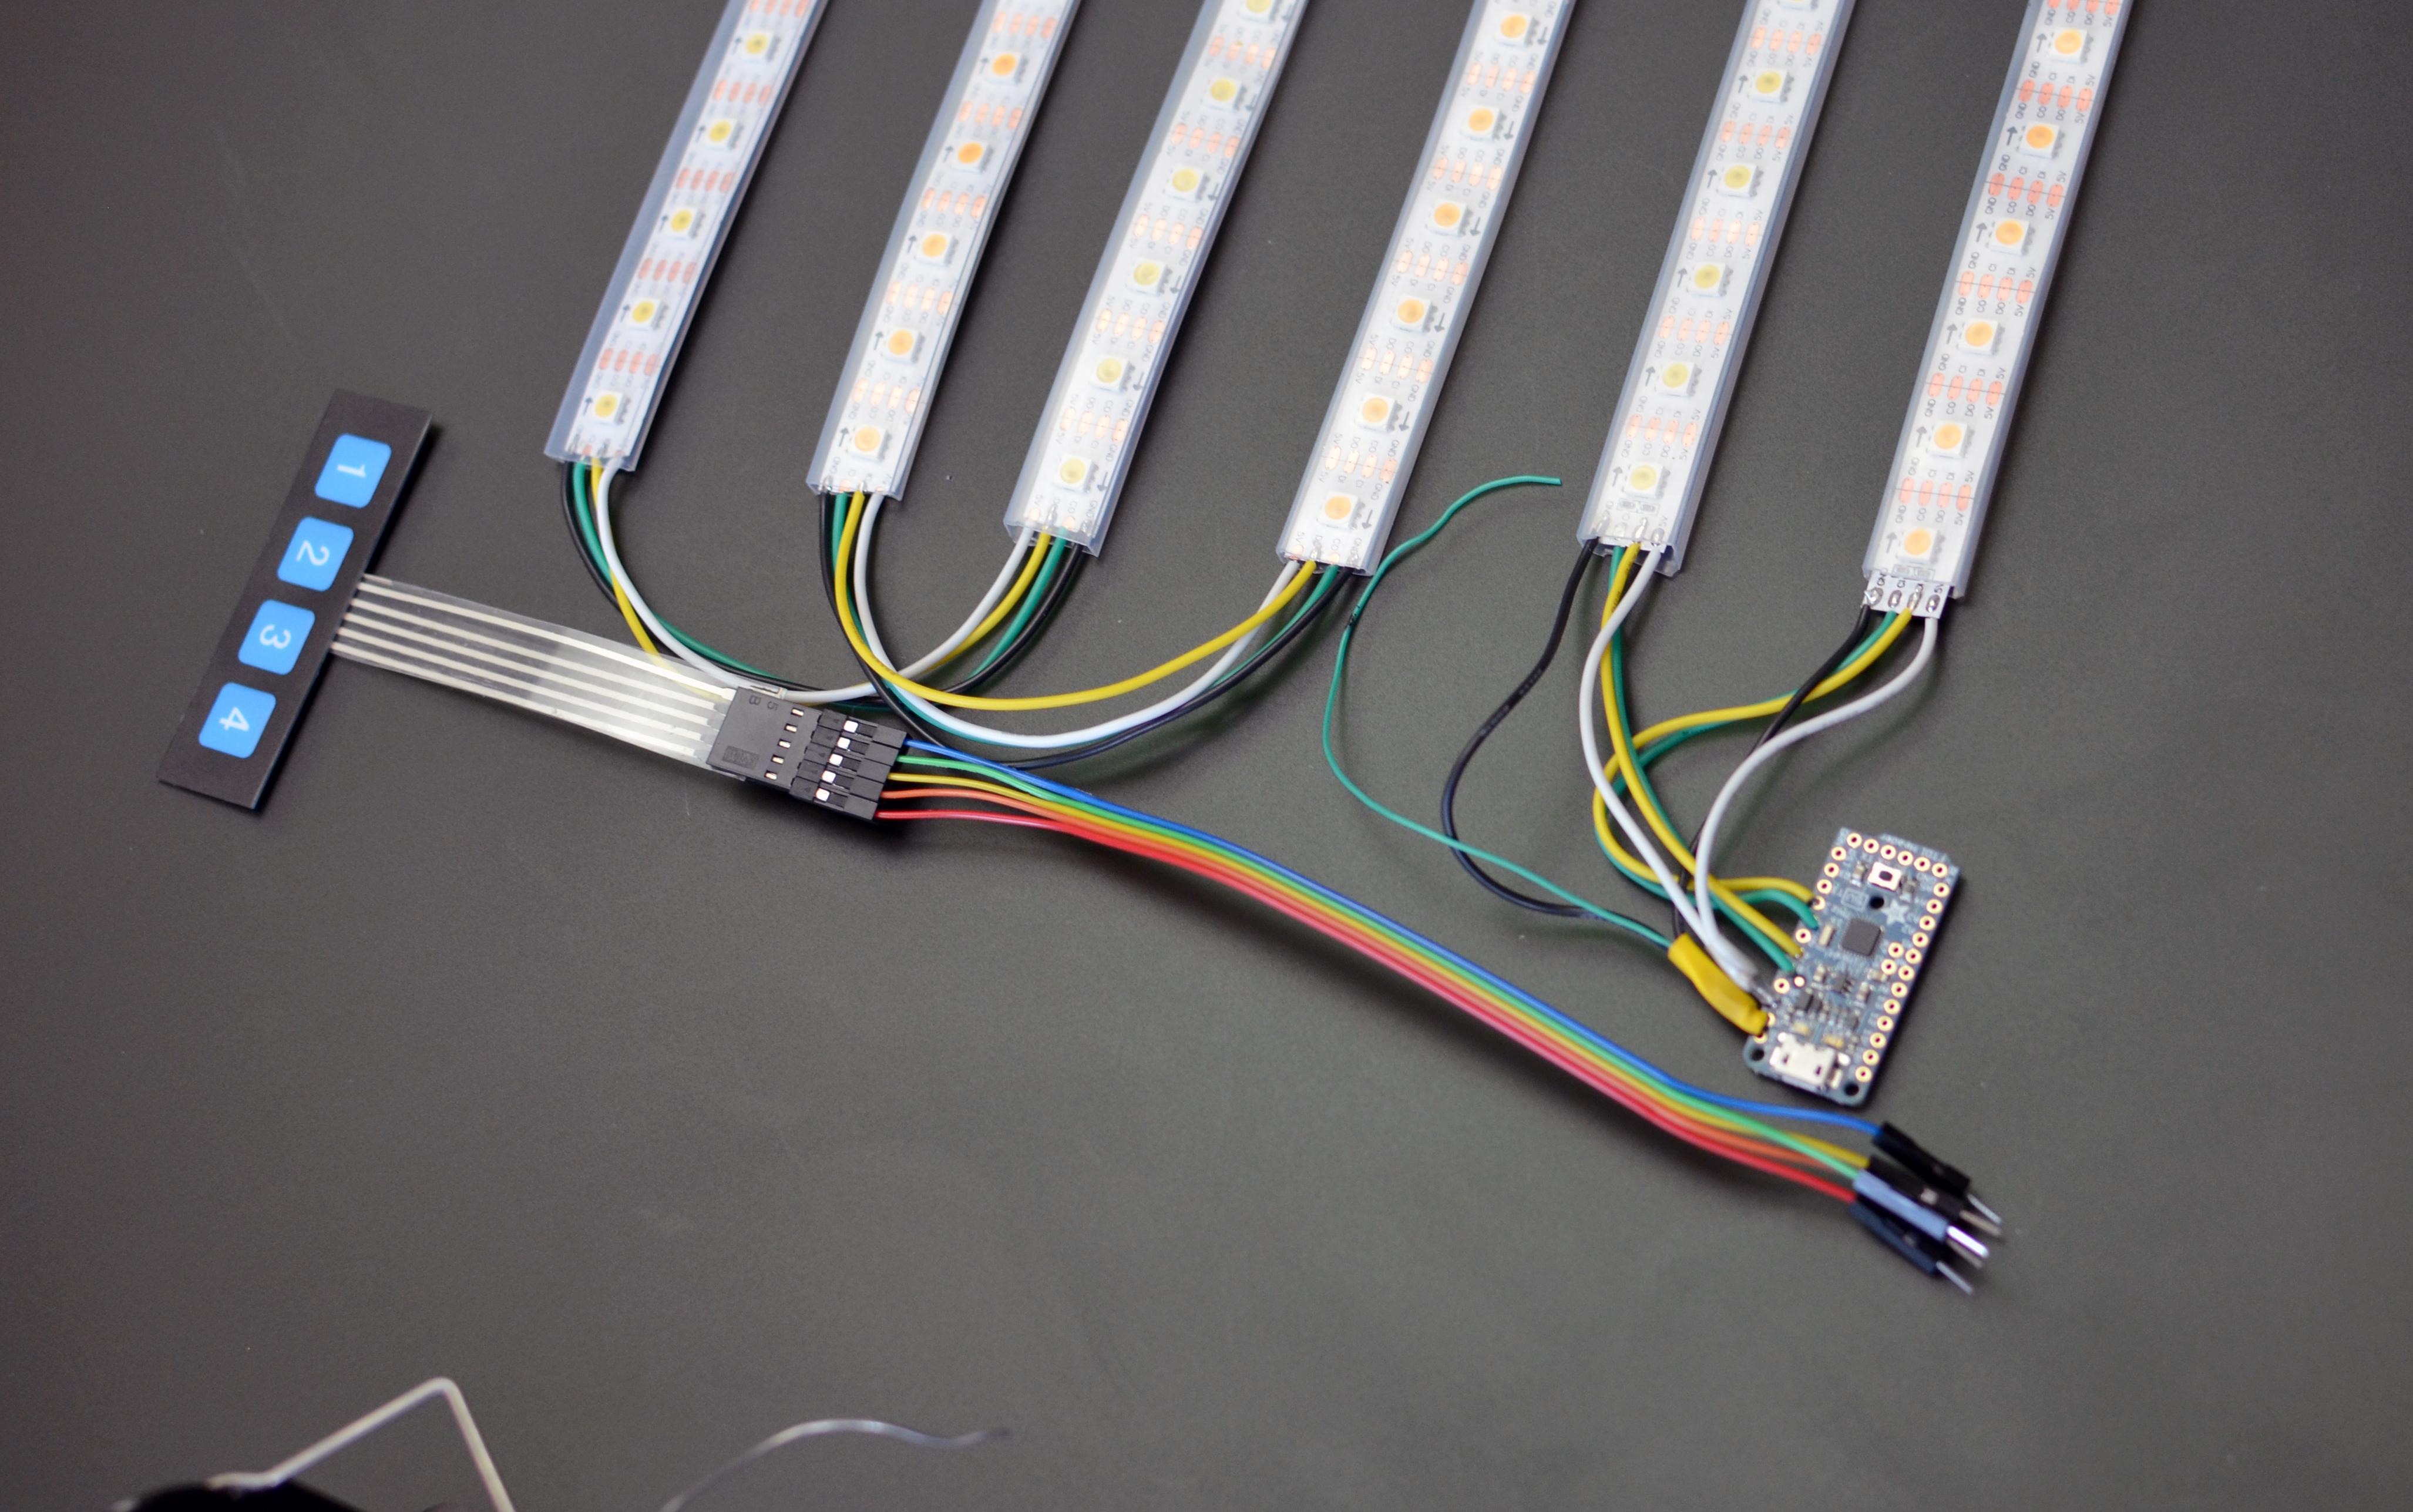 led_strips_roll-up-video-light-button-setup.jpg